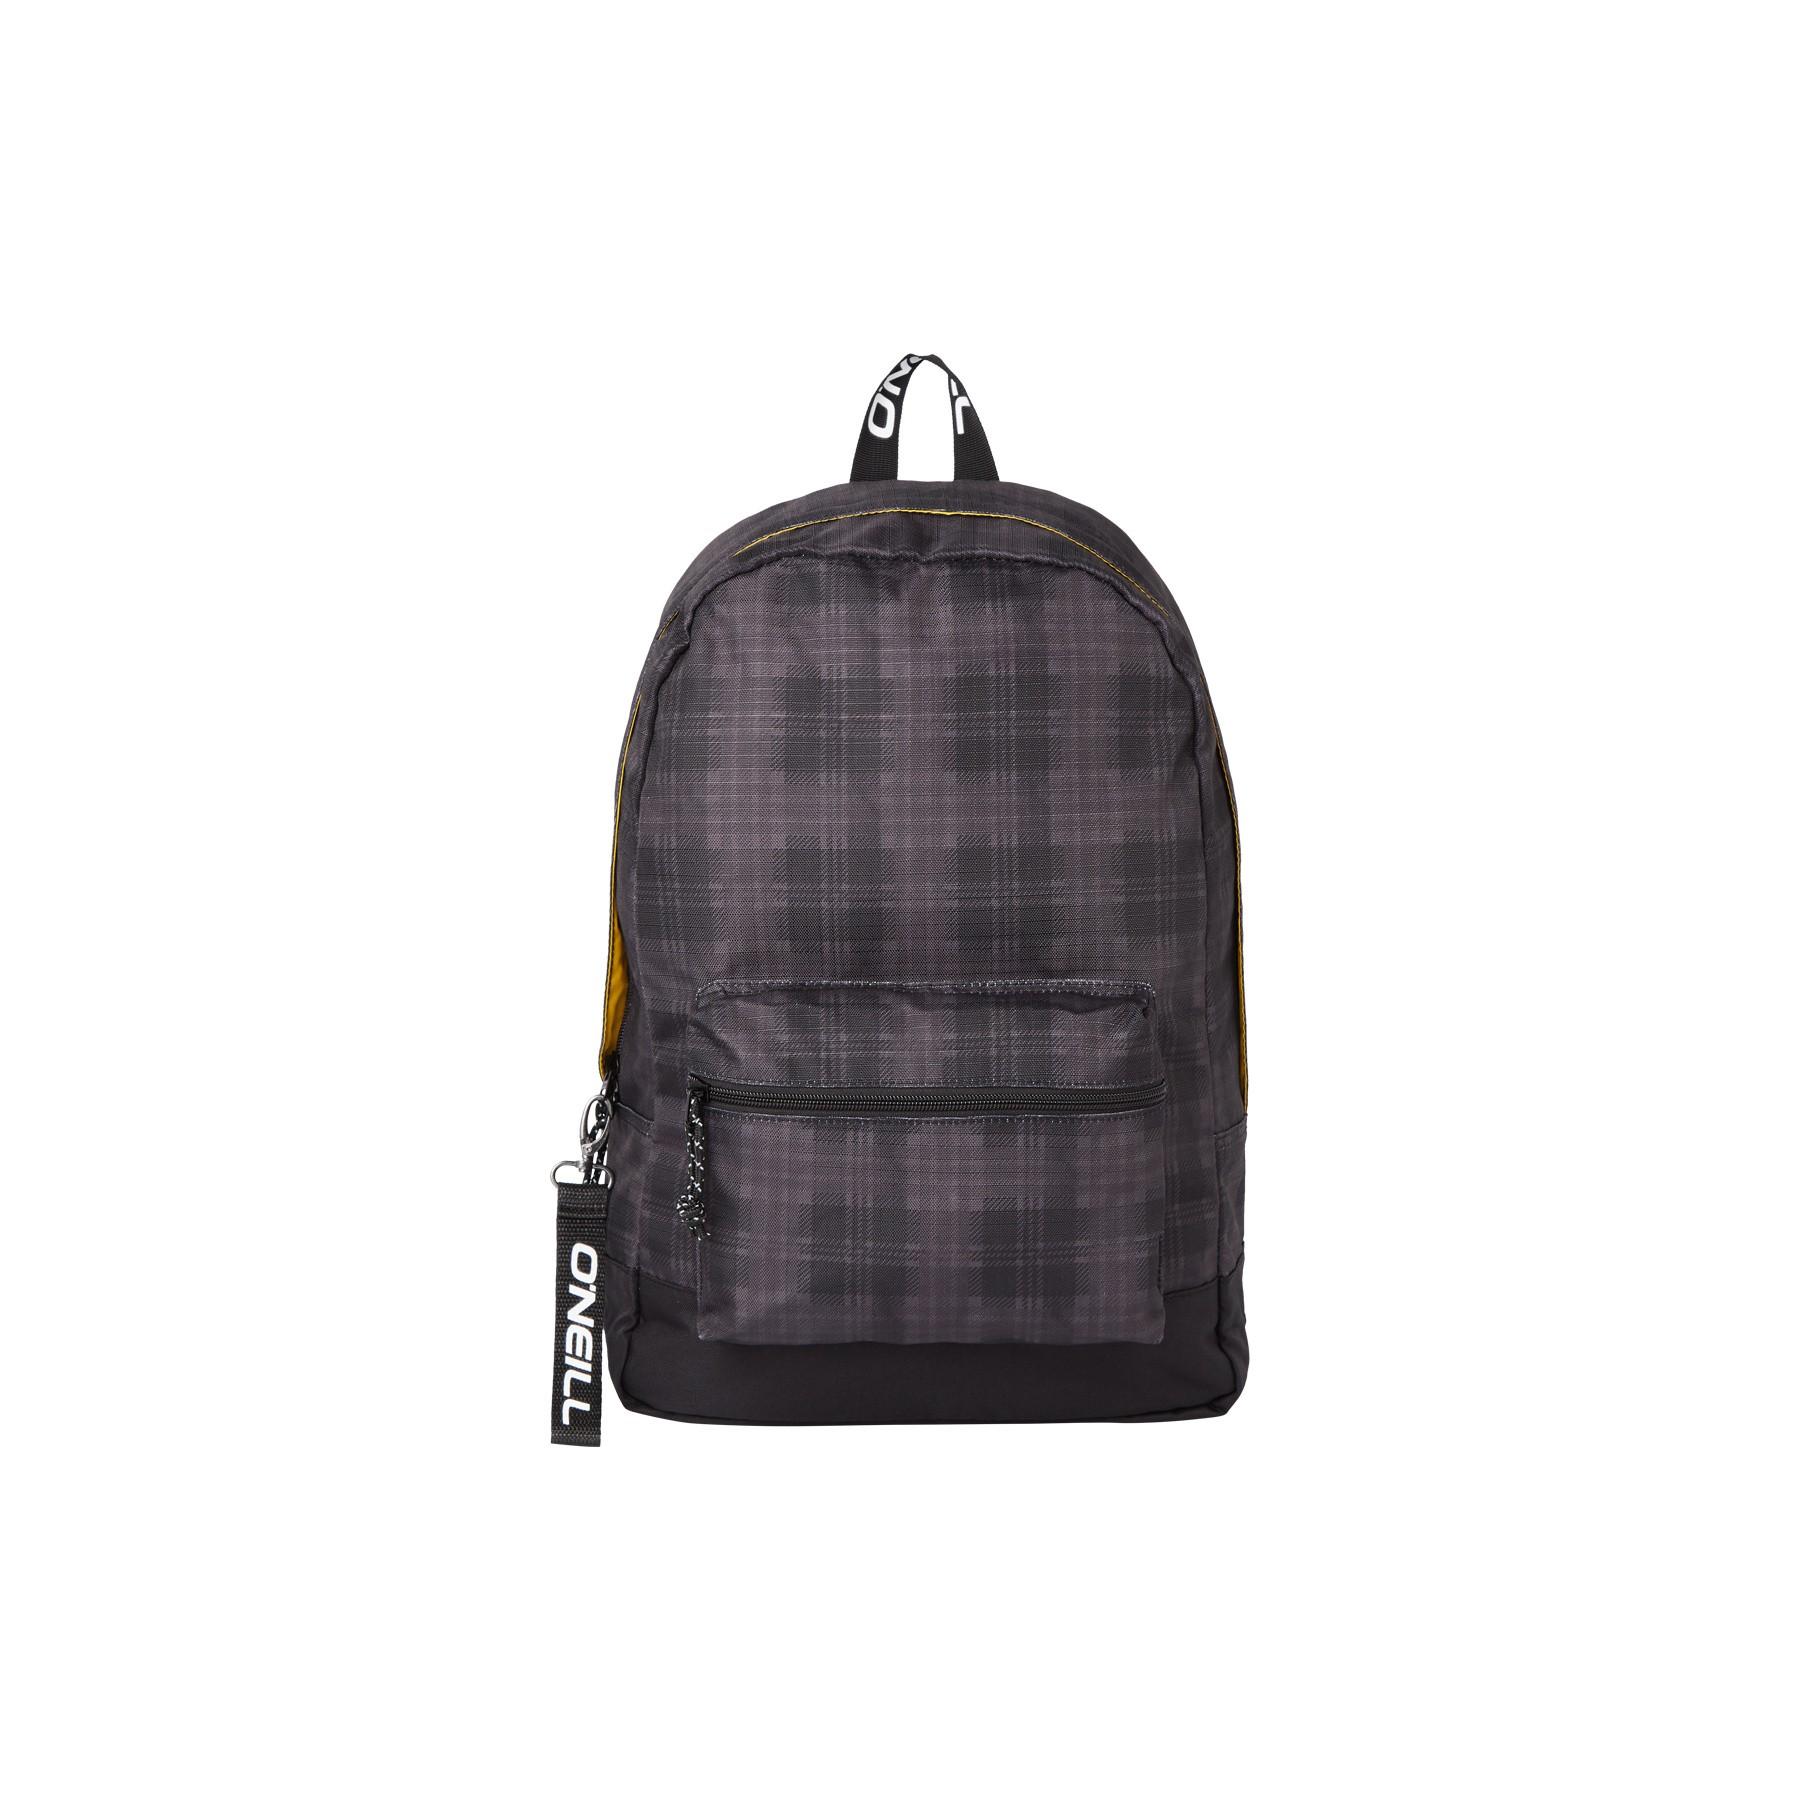 O'Neill Coastline Plus Backpack 8990 Grey AOP